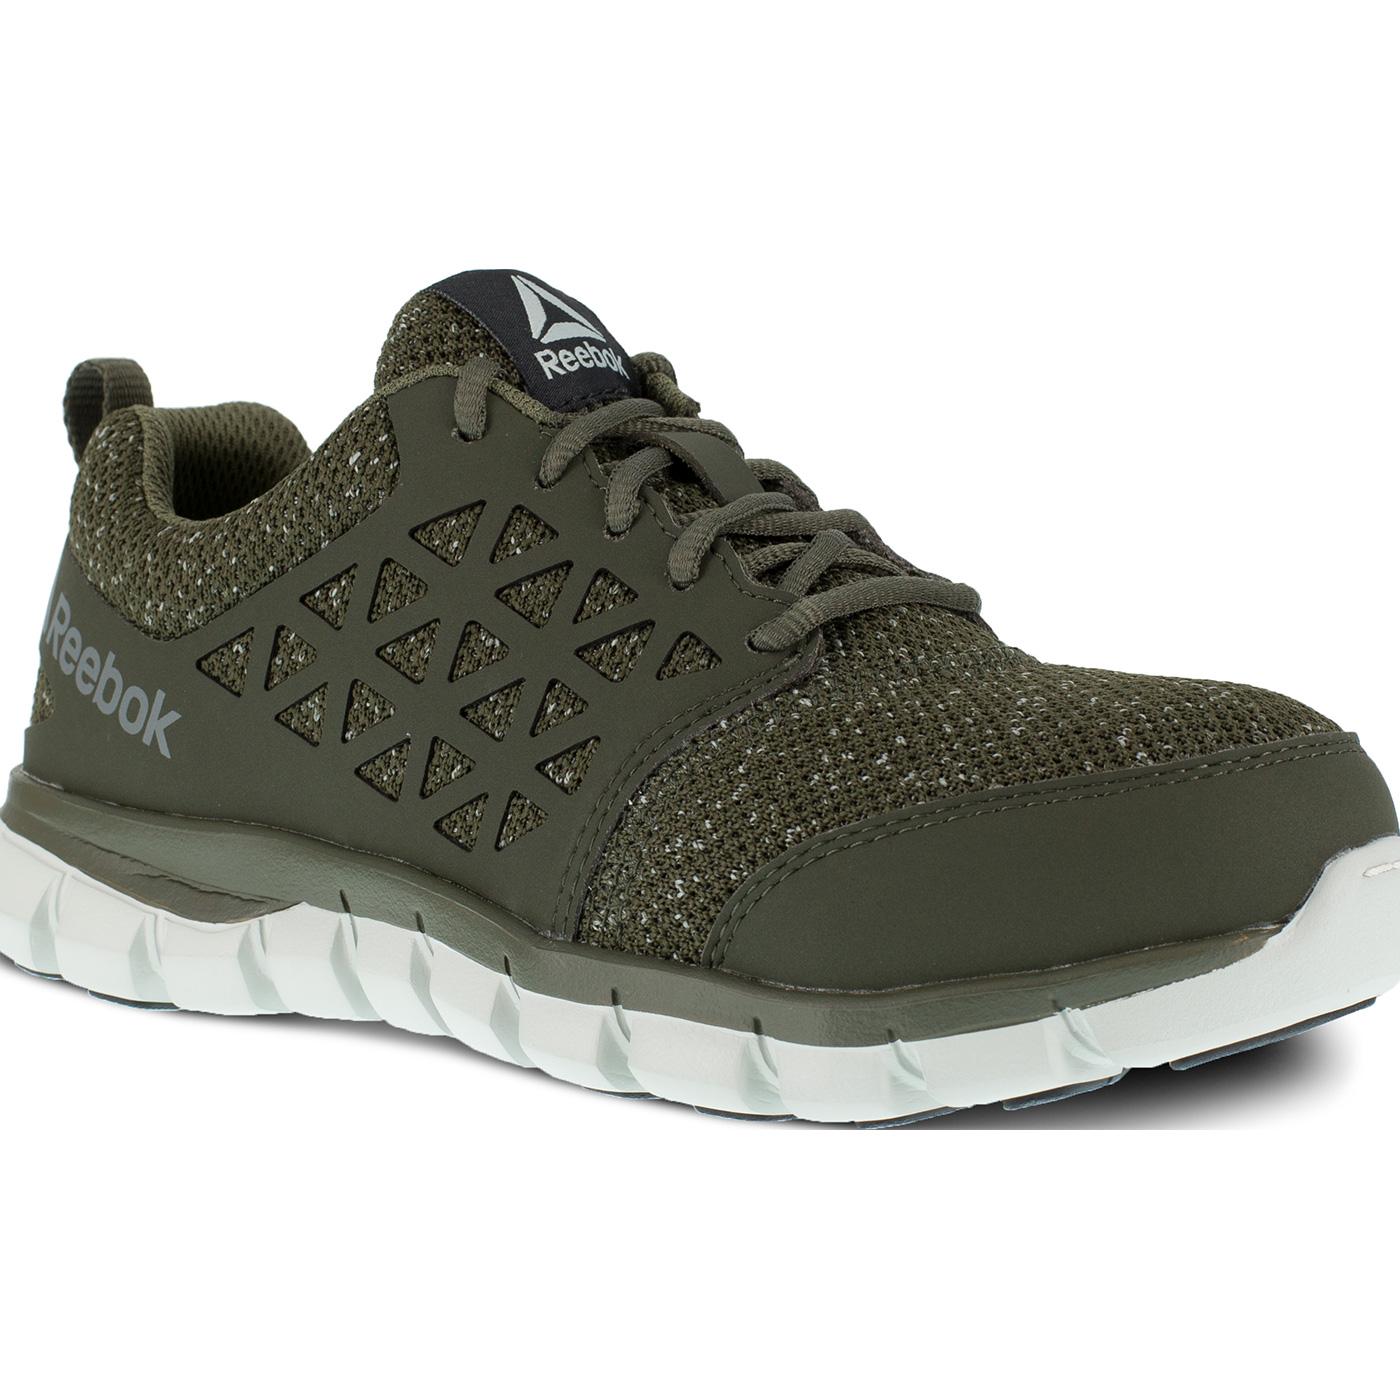 55768b497f9 Reebok Sublite Cushion Work Women's Composite Toe Electrical Hazard  Athletic Work Shoe